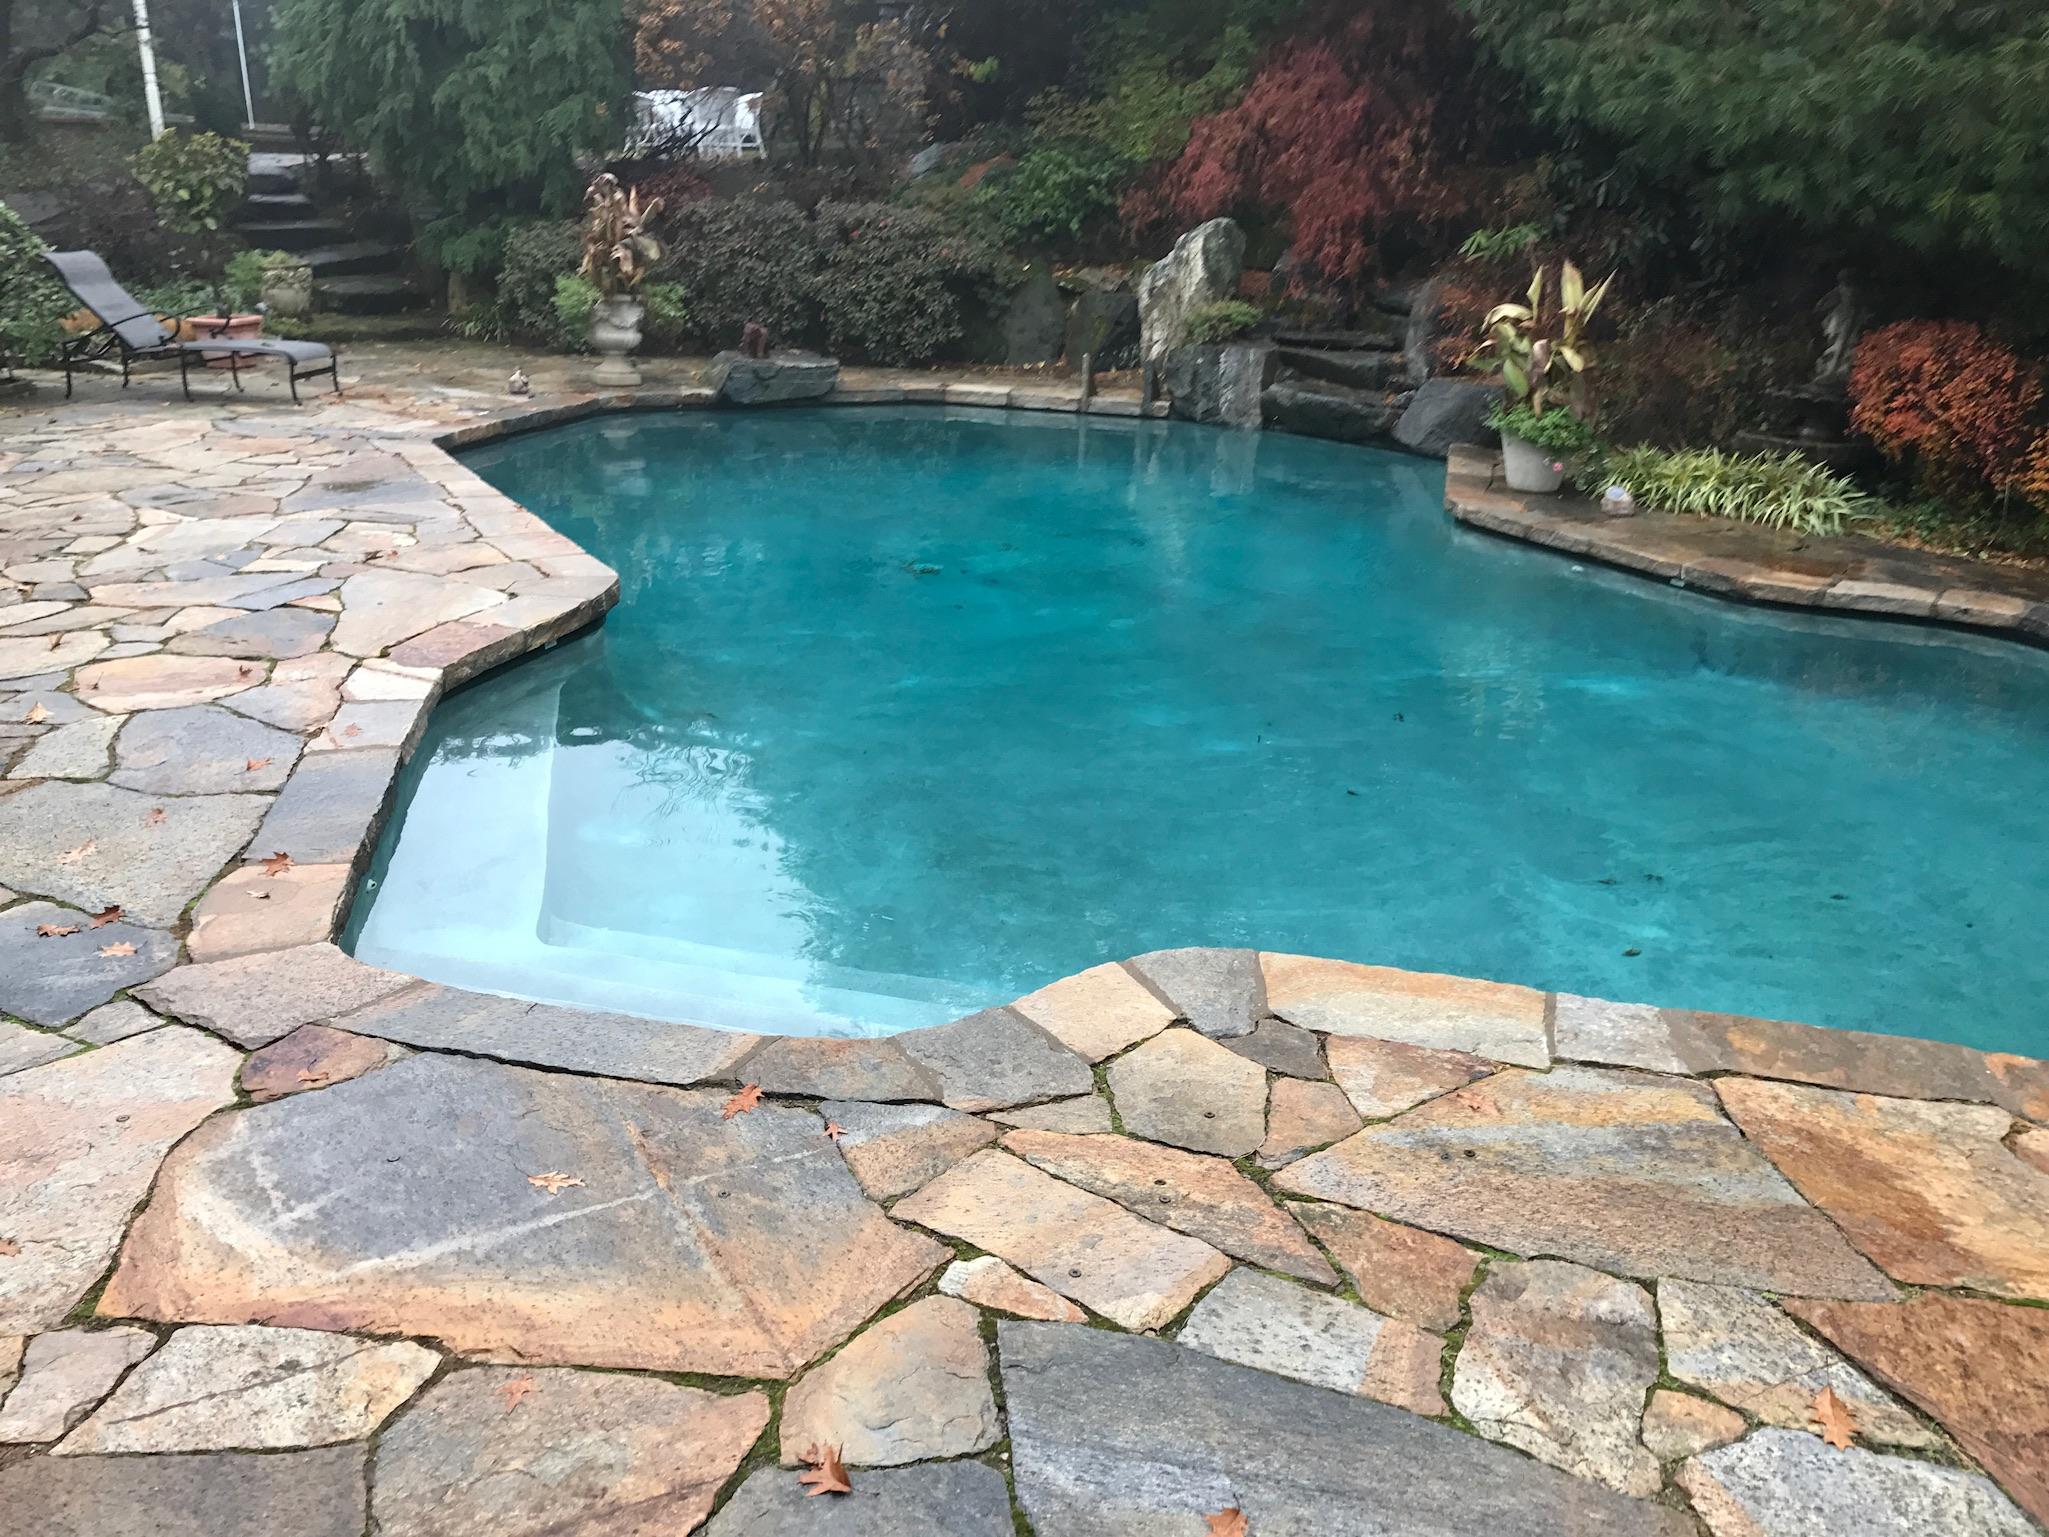 Putnam Swimming Pool Service Inc